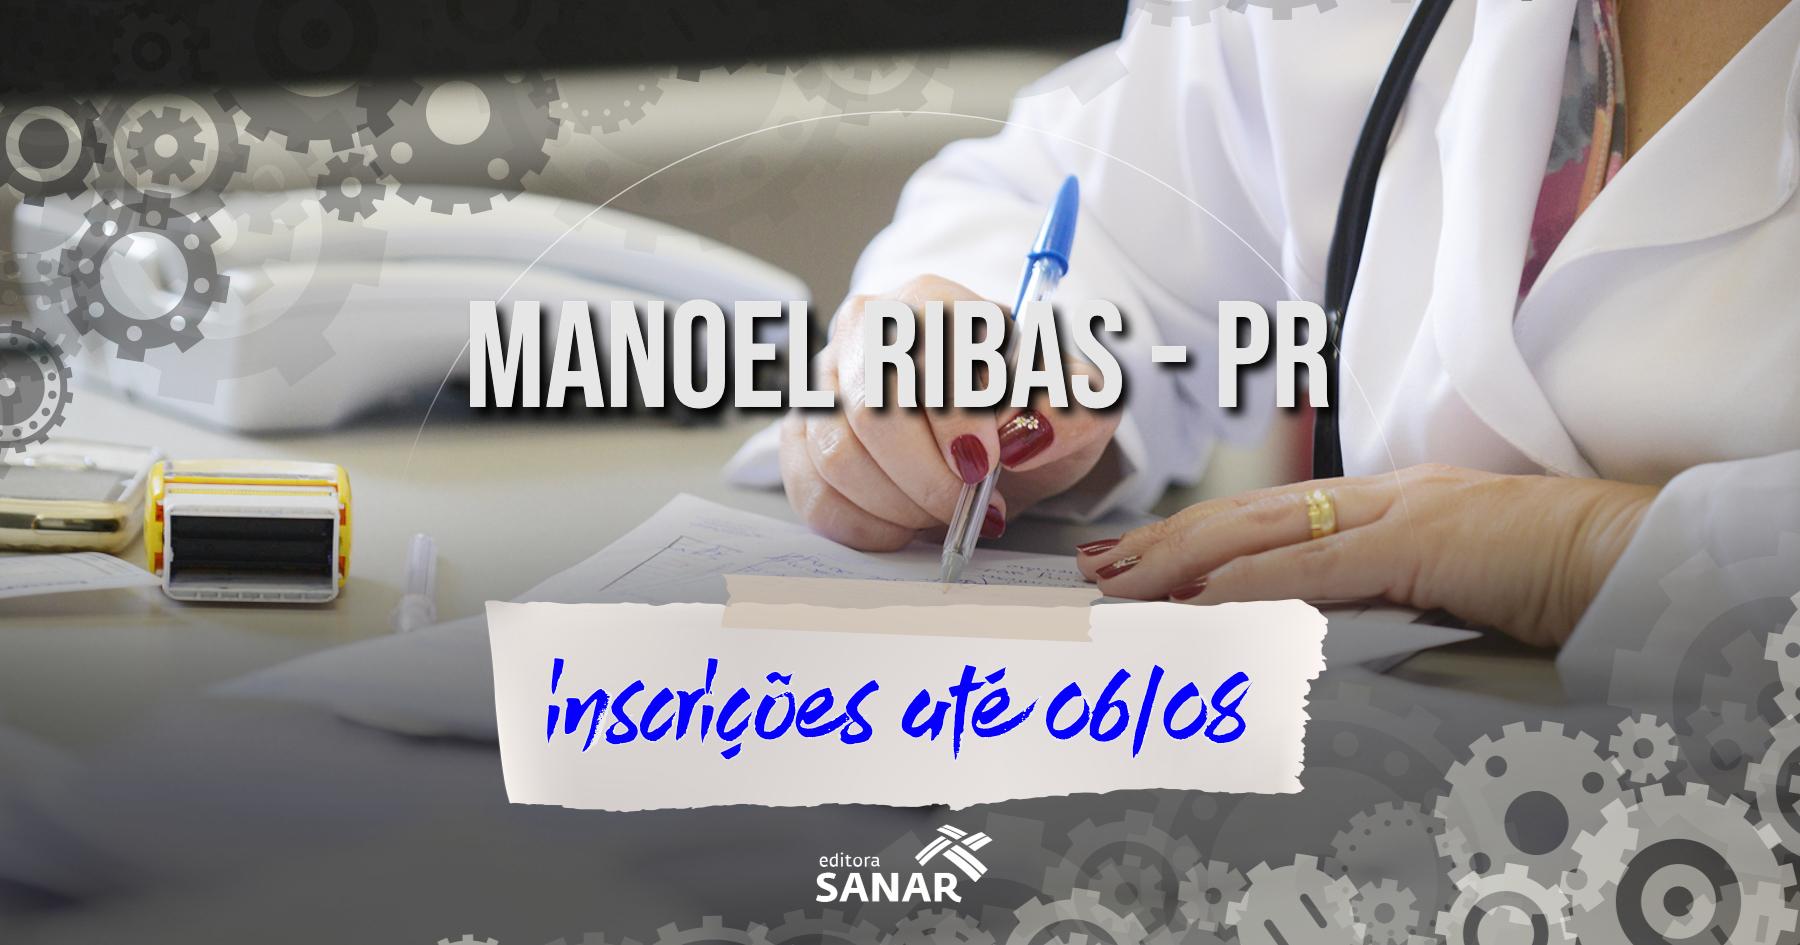 Concurso | Manoel Ribas (PR) oferece salário de R$ 14 mil